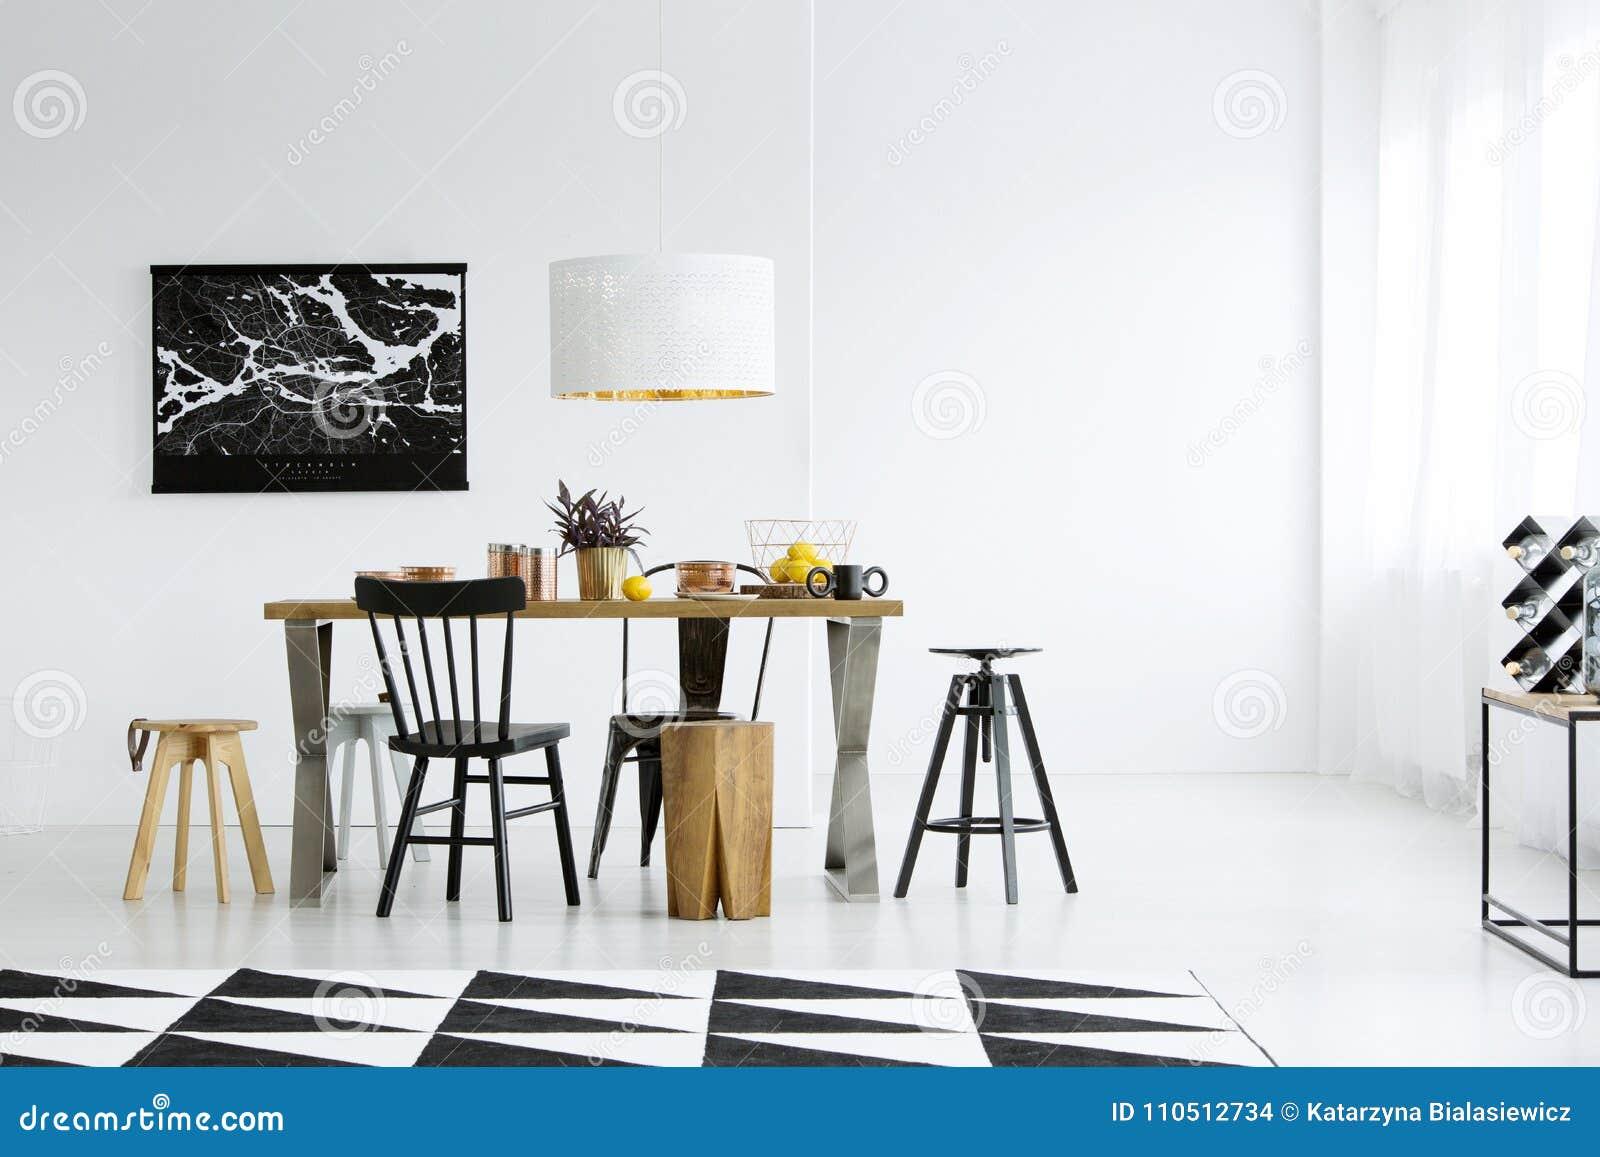 Swell Black And White Dining Room Stock Photo Image Of Lamp Creativecarmelina Interior Chair Design Creativecarmelinacom